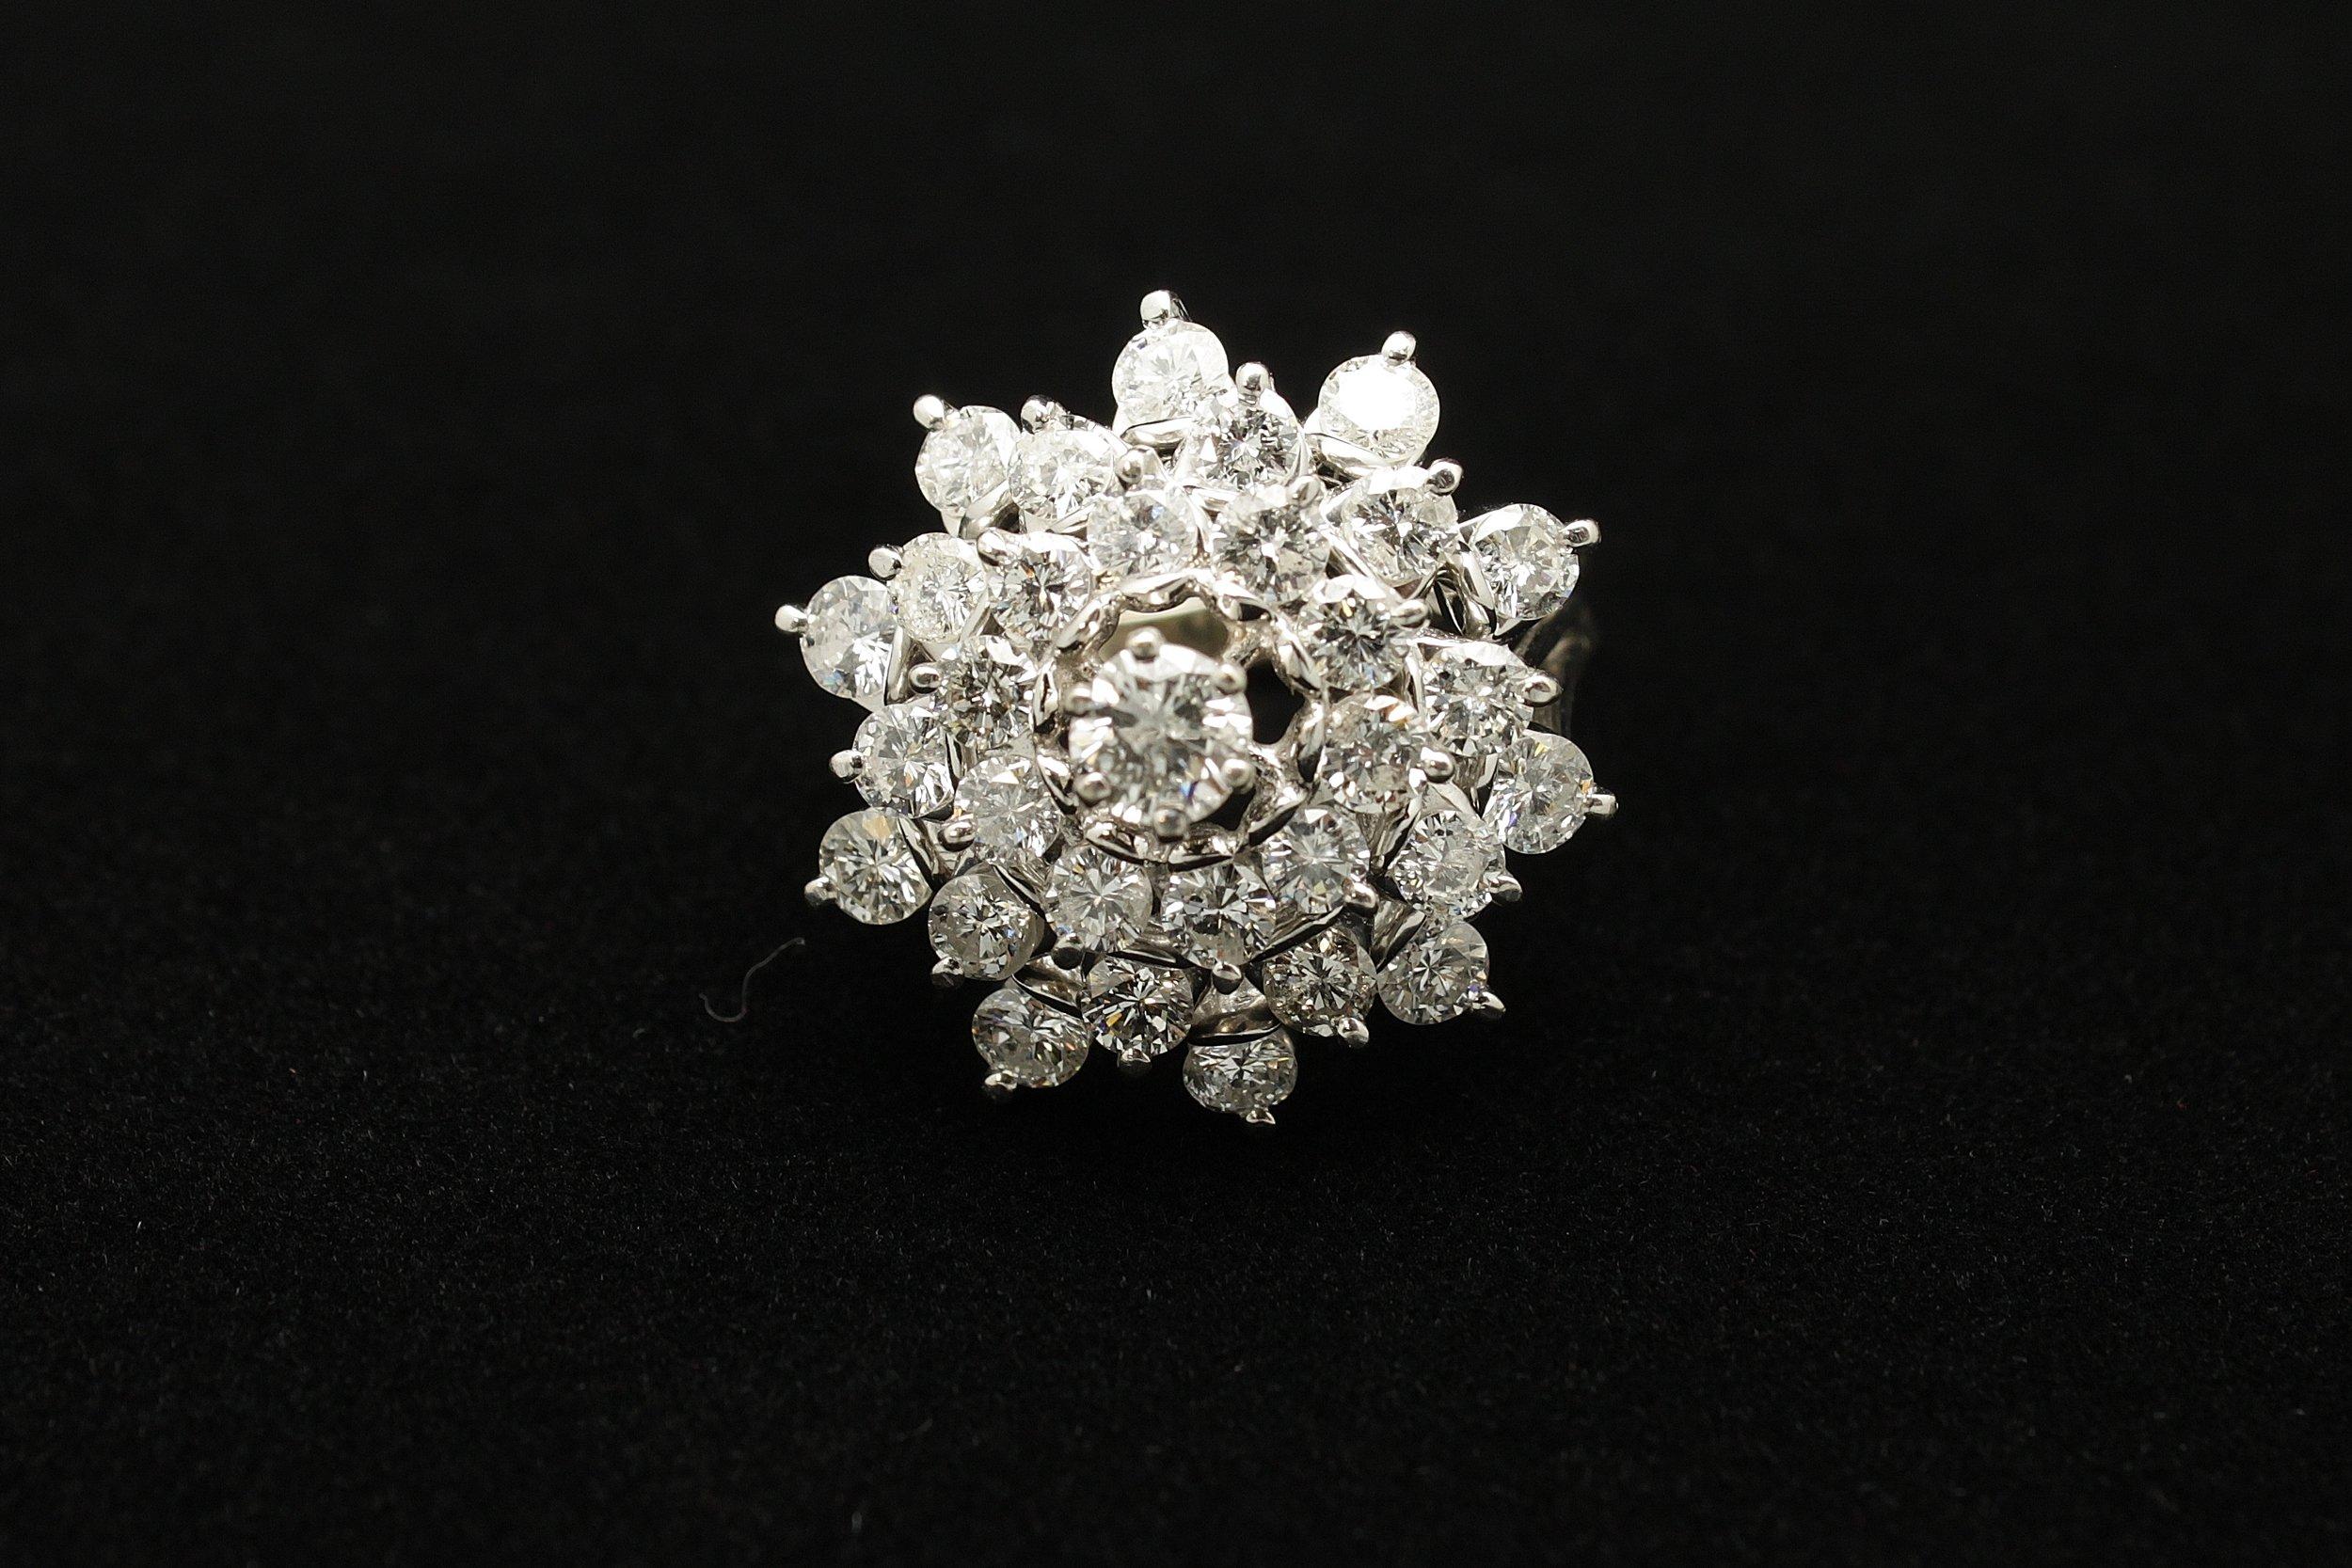 Vintage 14kt Diamond Ring 4.9cts